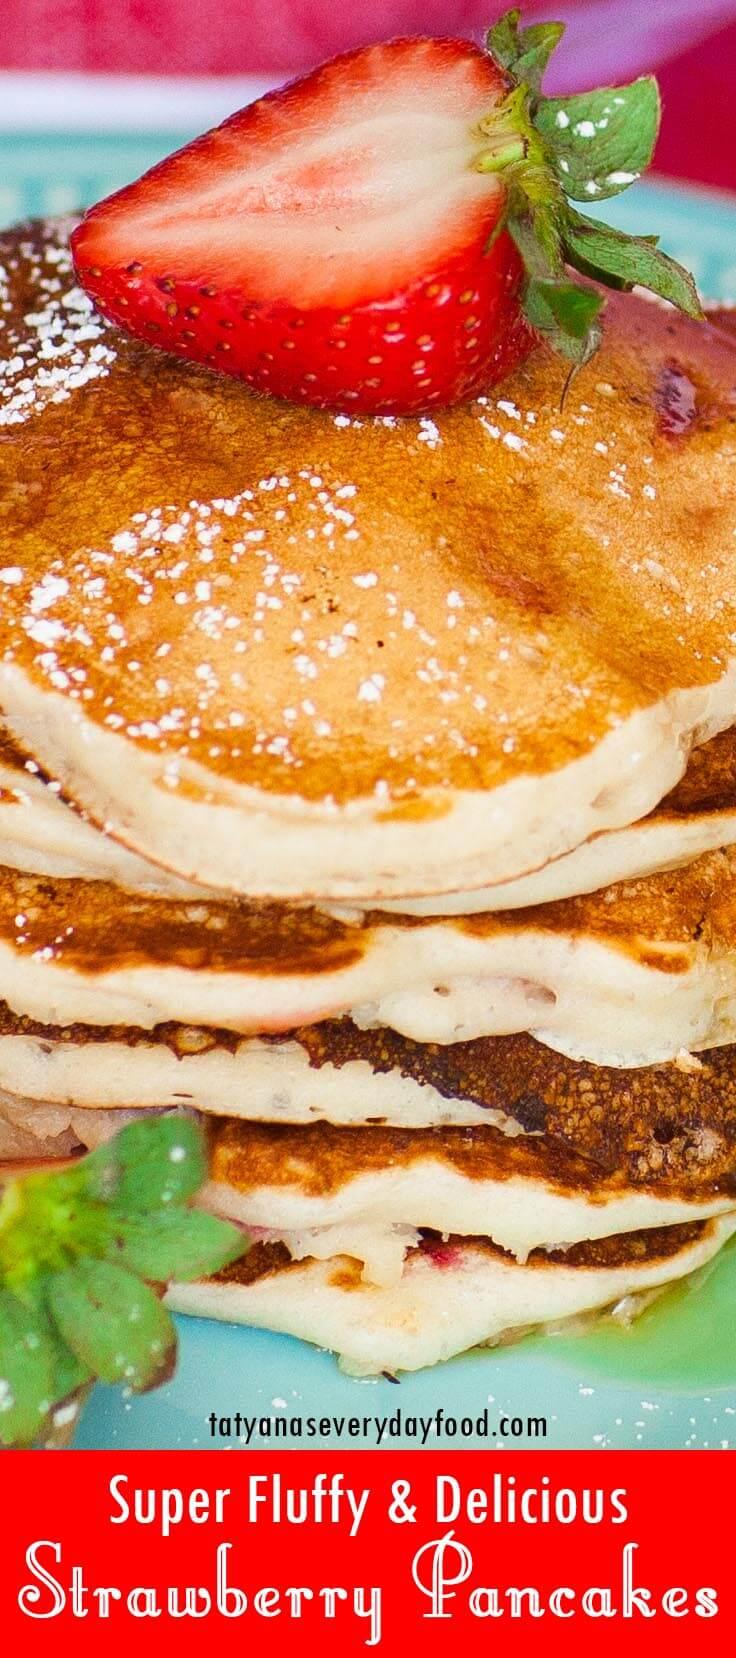 Super Fluffy Strawberry Pancakes video recipe